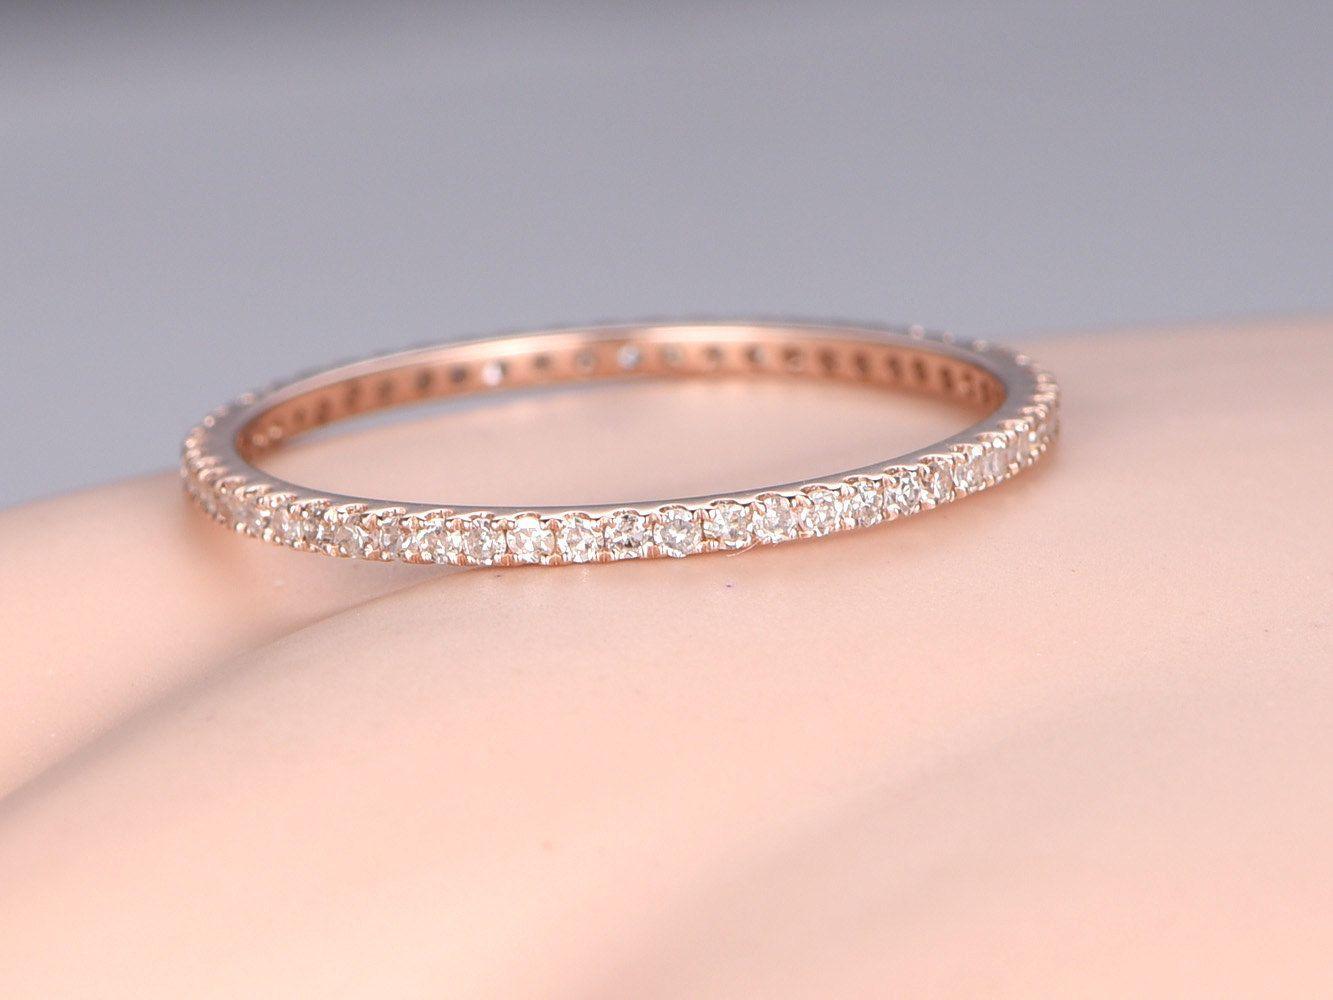 Diamond wedding band,Petite French micro pave band,solid 14k rose ...